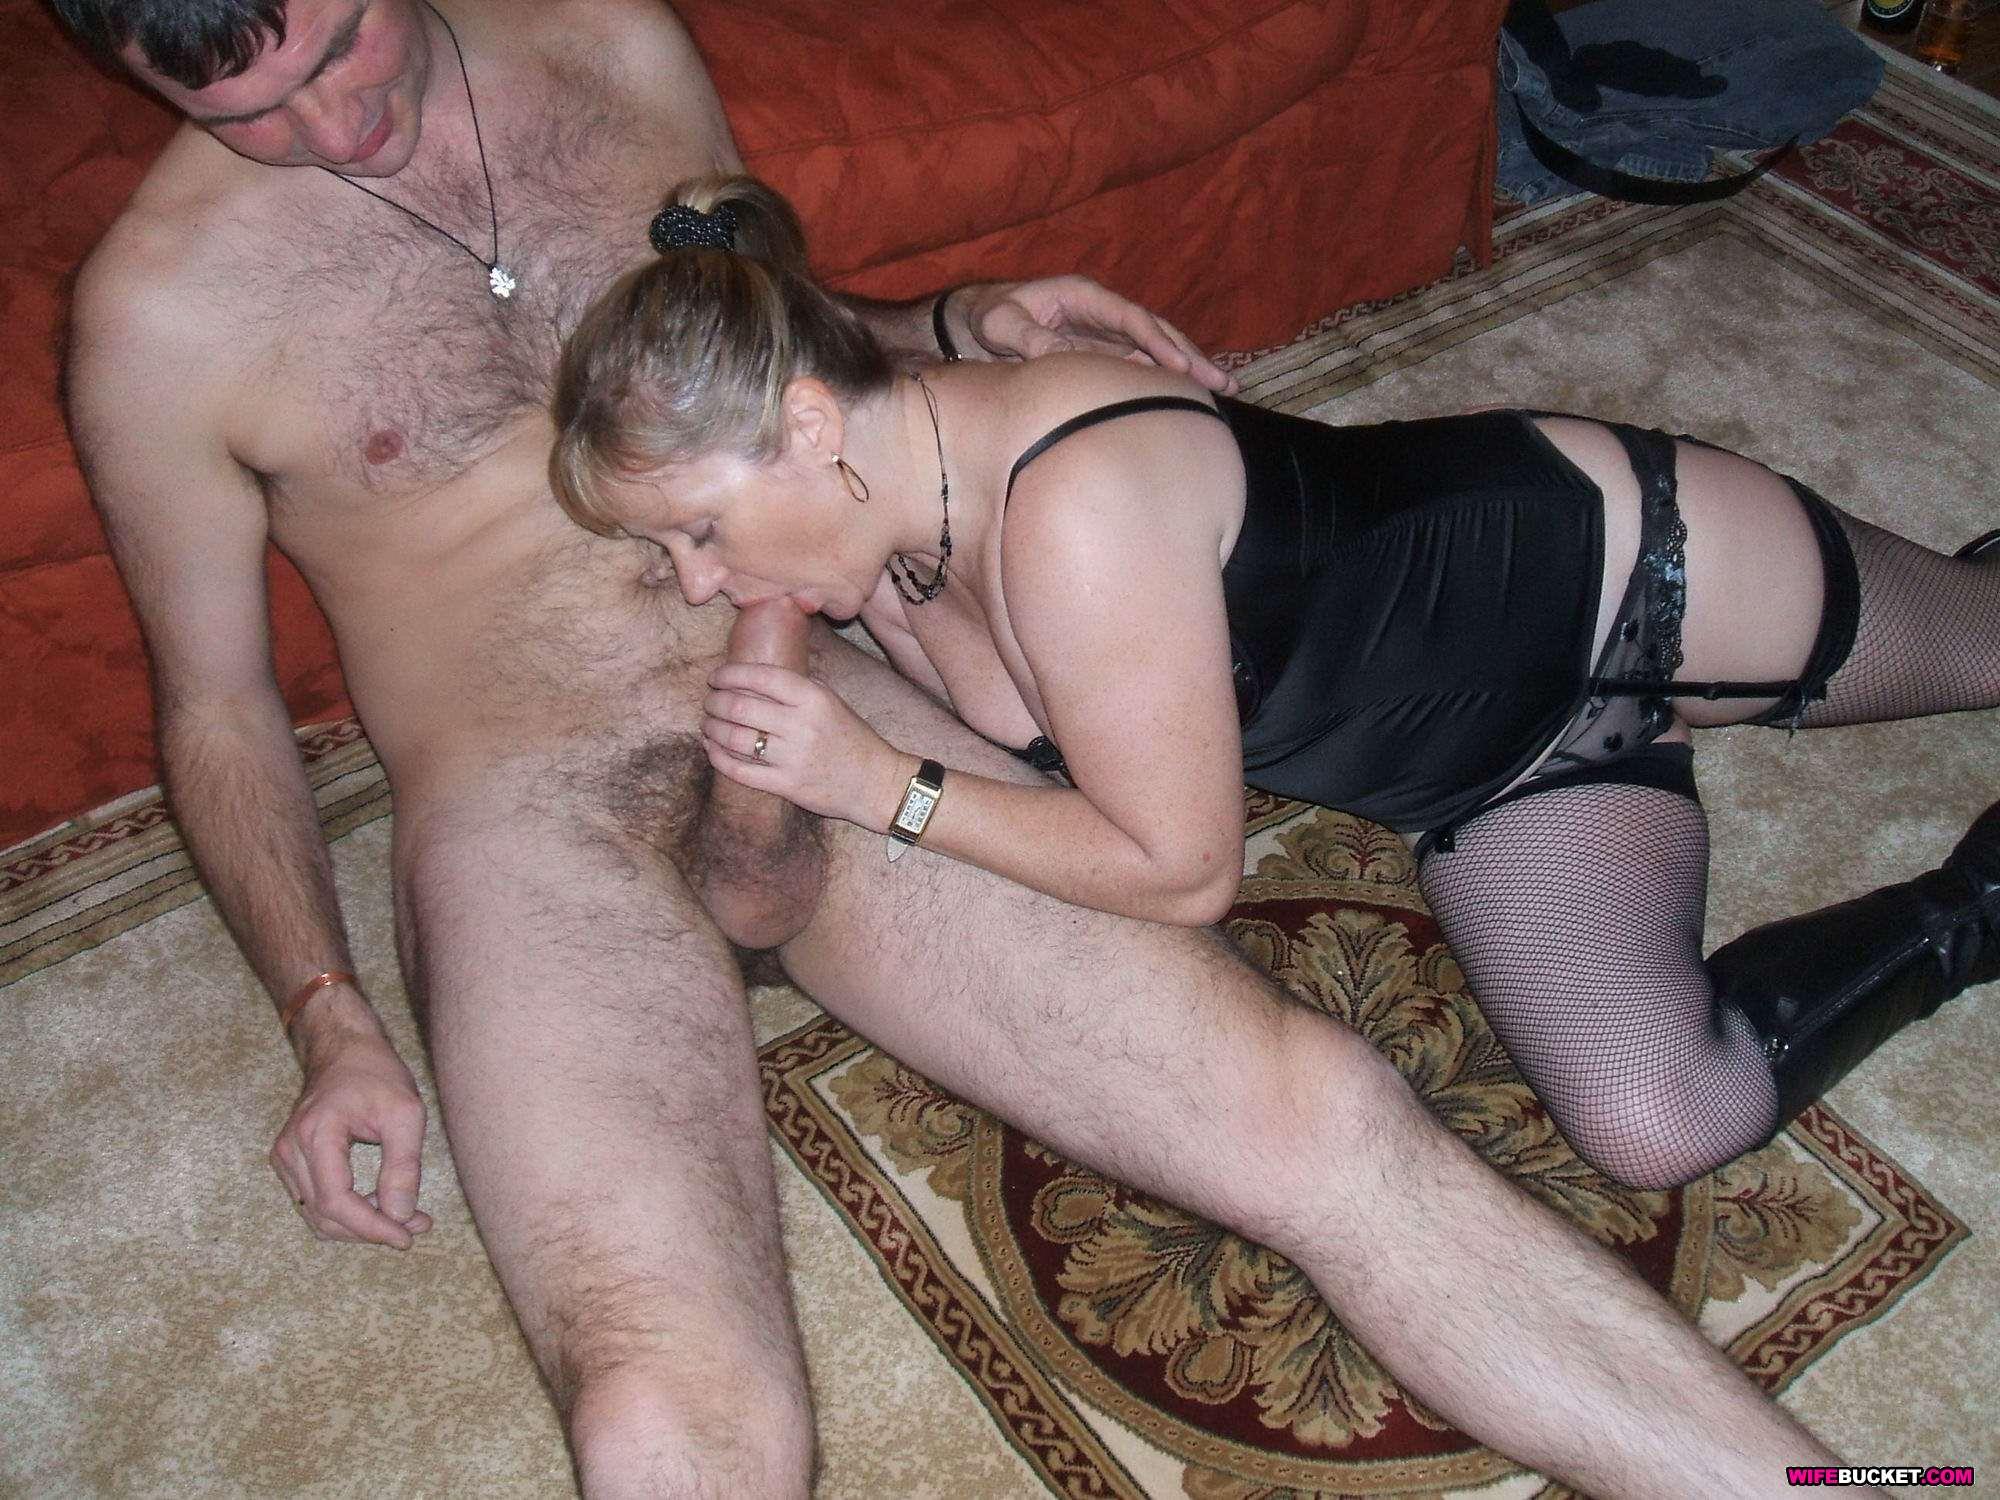 Фото девушки пьяная ебля с женами онлайн бразерс порно